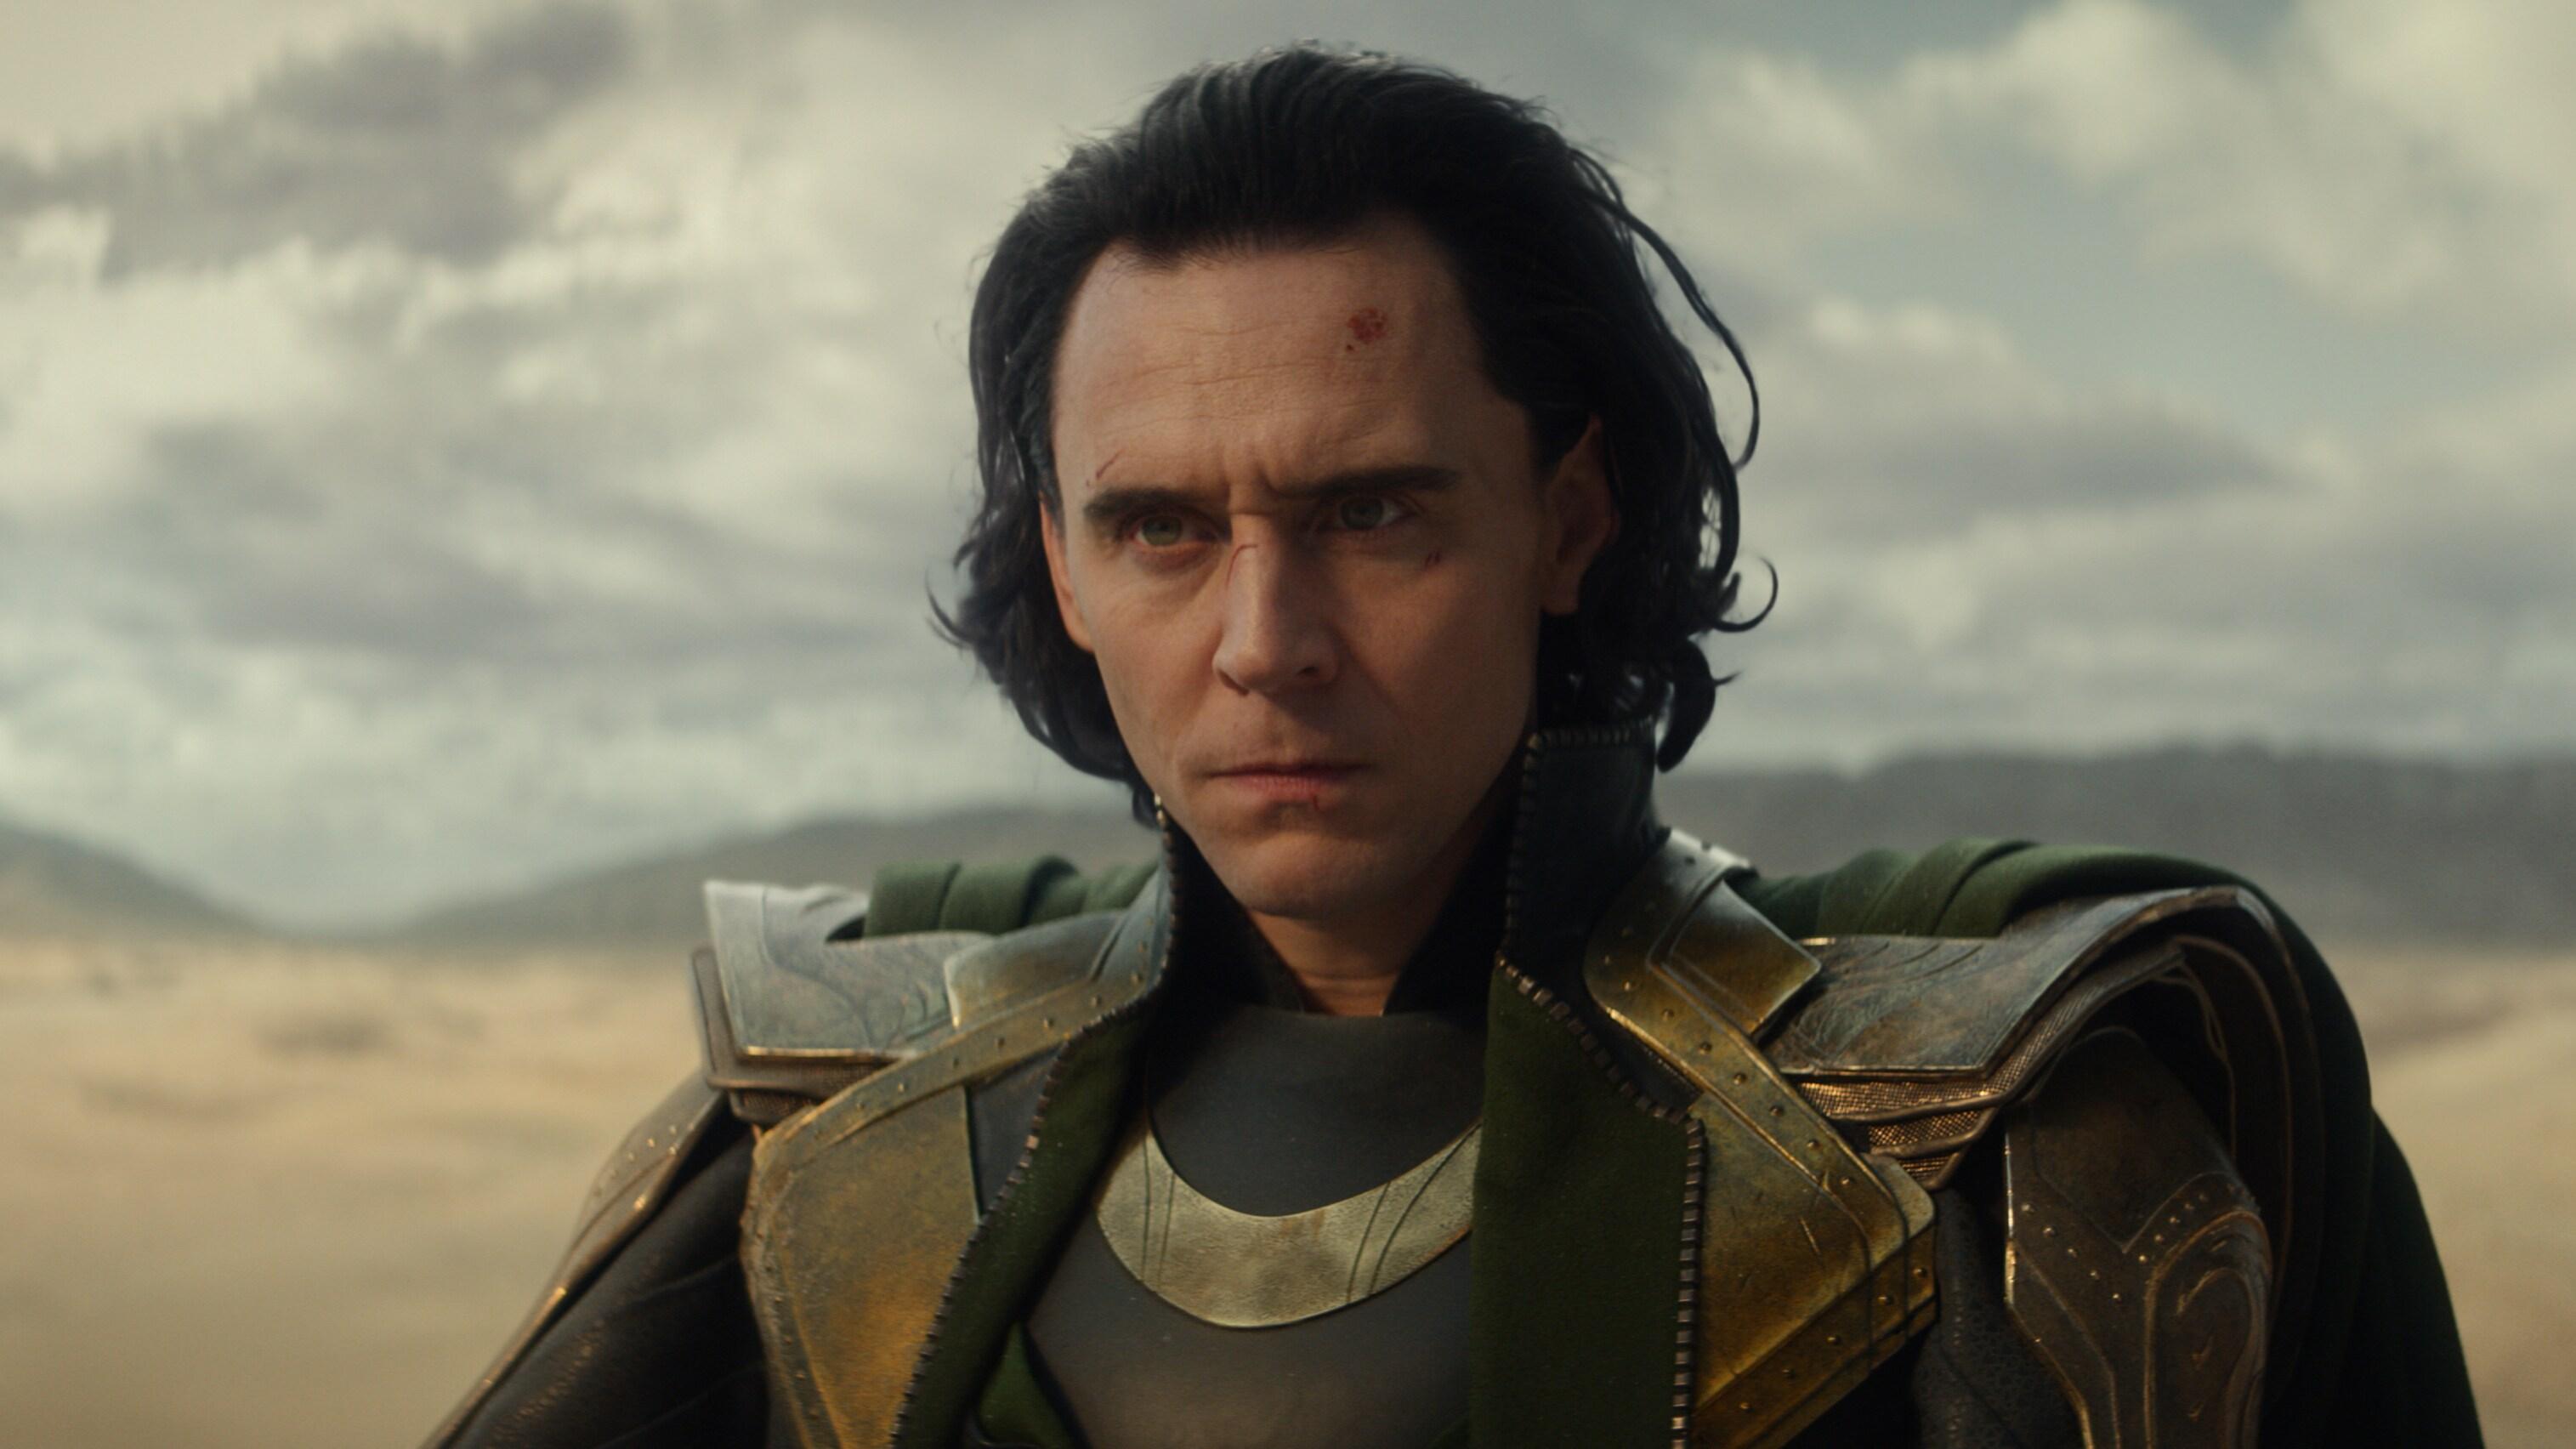 Tom Hiddleston as Loki in Marvel Studios' LOKI exclusively on Disney+. Photo courtesy of Marvel Studios. ©Marvel Studios 2021. All Rights Reserved.